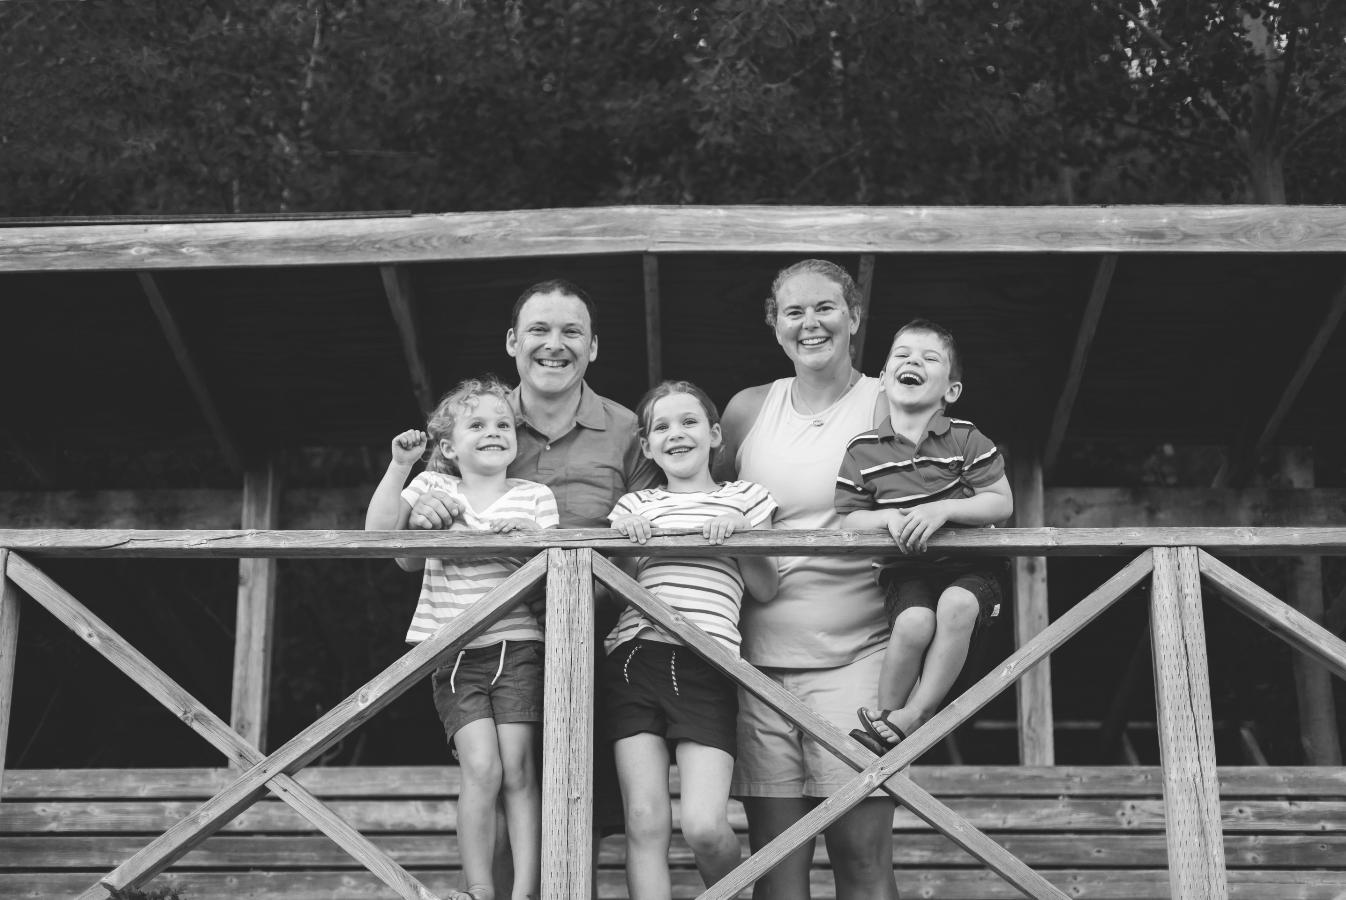 Hamilton-Toronto-Burlington-Oakville-welland-Niagara-Cambridge-Dundas-Ontario-Family-photographer-photography-Moments-by-Lauren-Nova-Scotia-Antigonish-Lifestyle-Session-Image-Photo-6.png